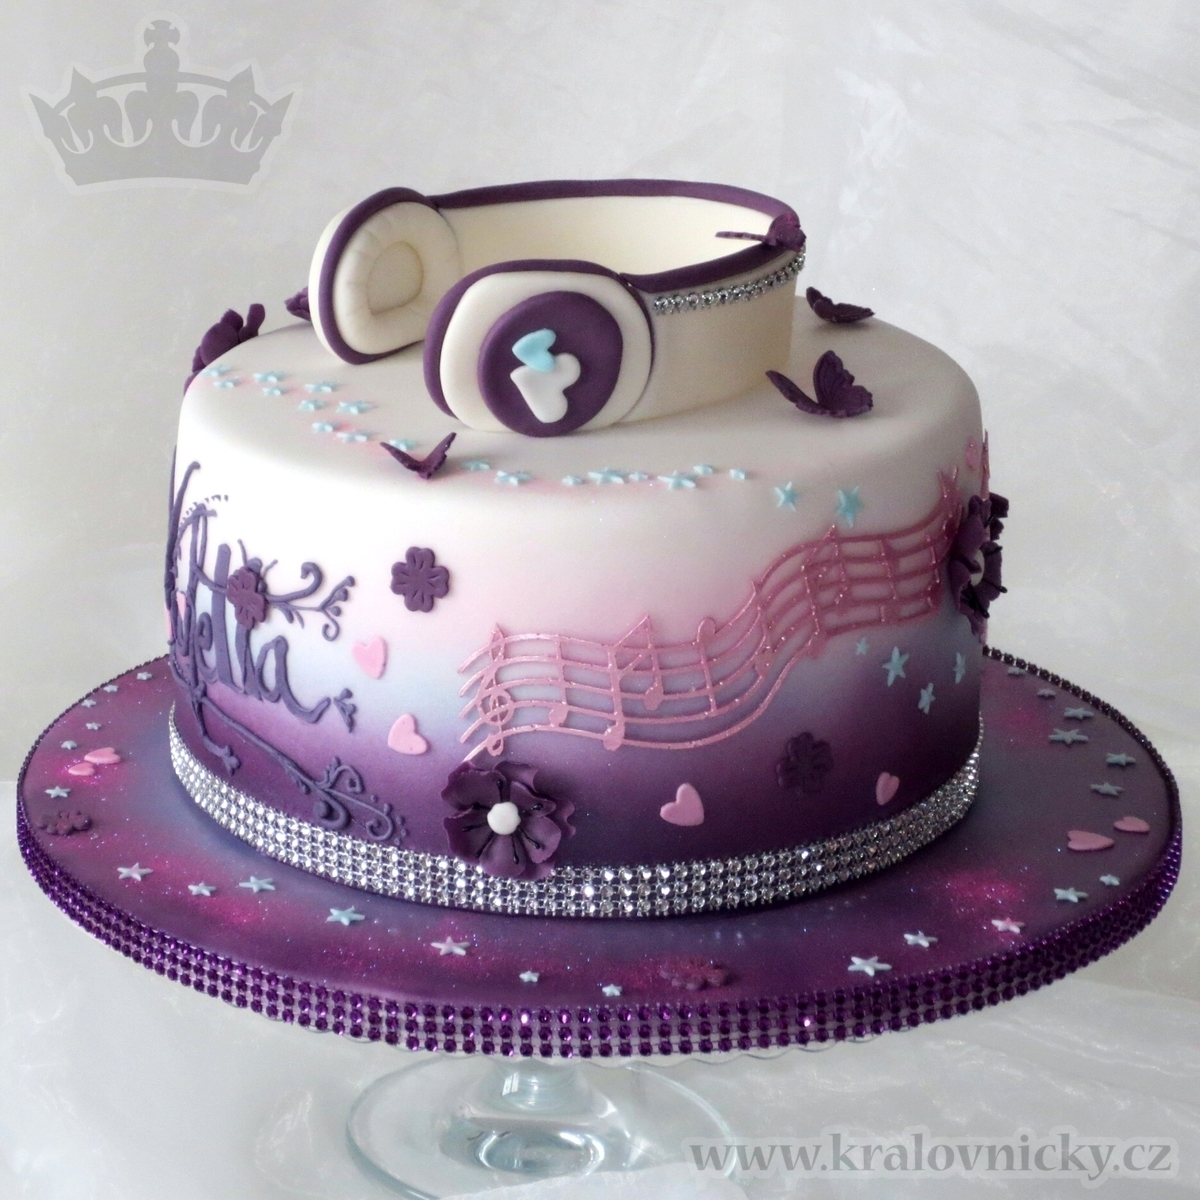 Cake Design Violetta : Violetta Music Star - CakeCentral.com